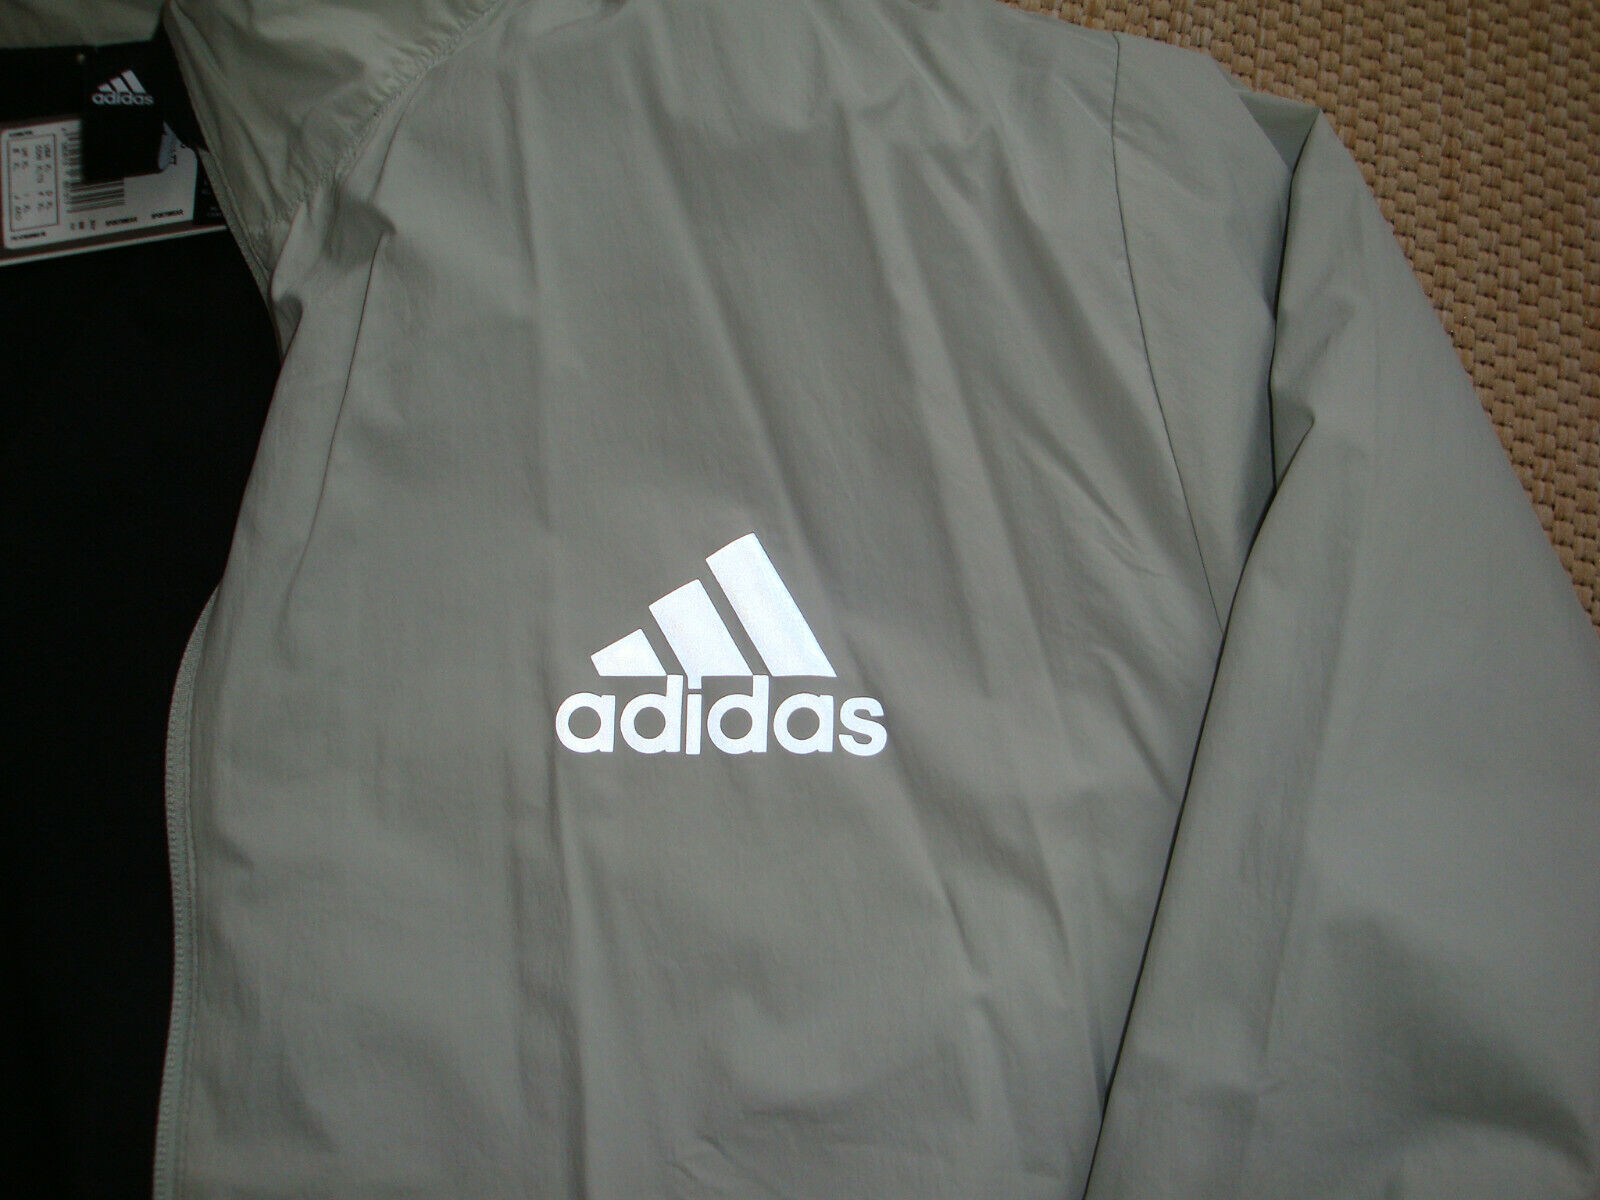 Adidas Freizeitjacke Herren Neu Gr.XL